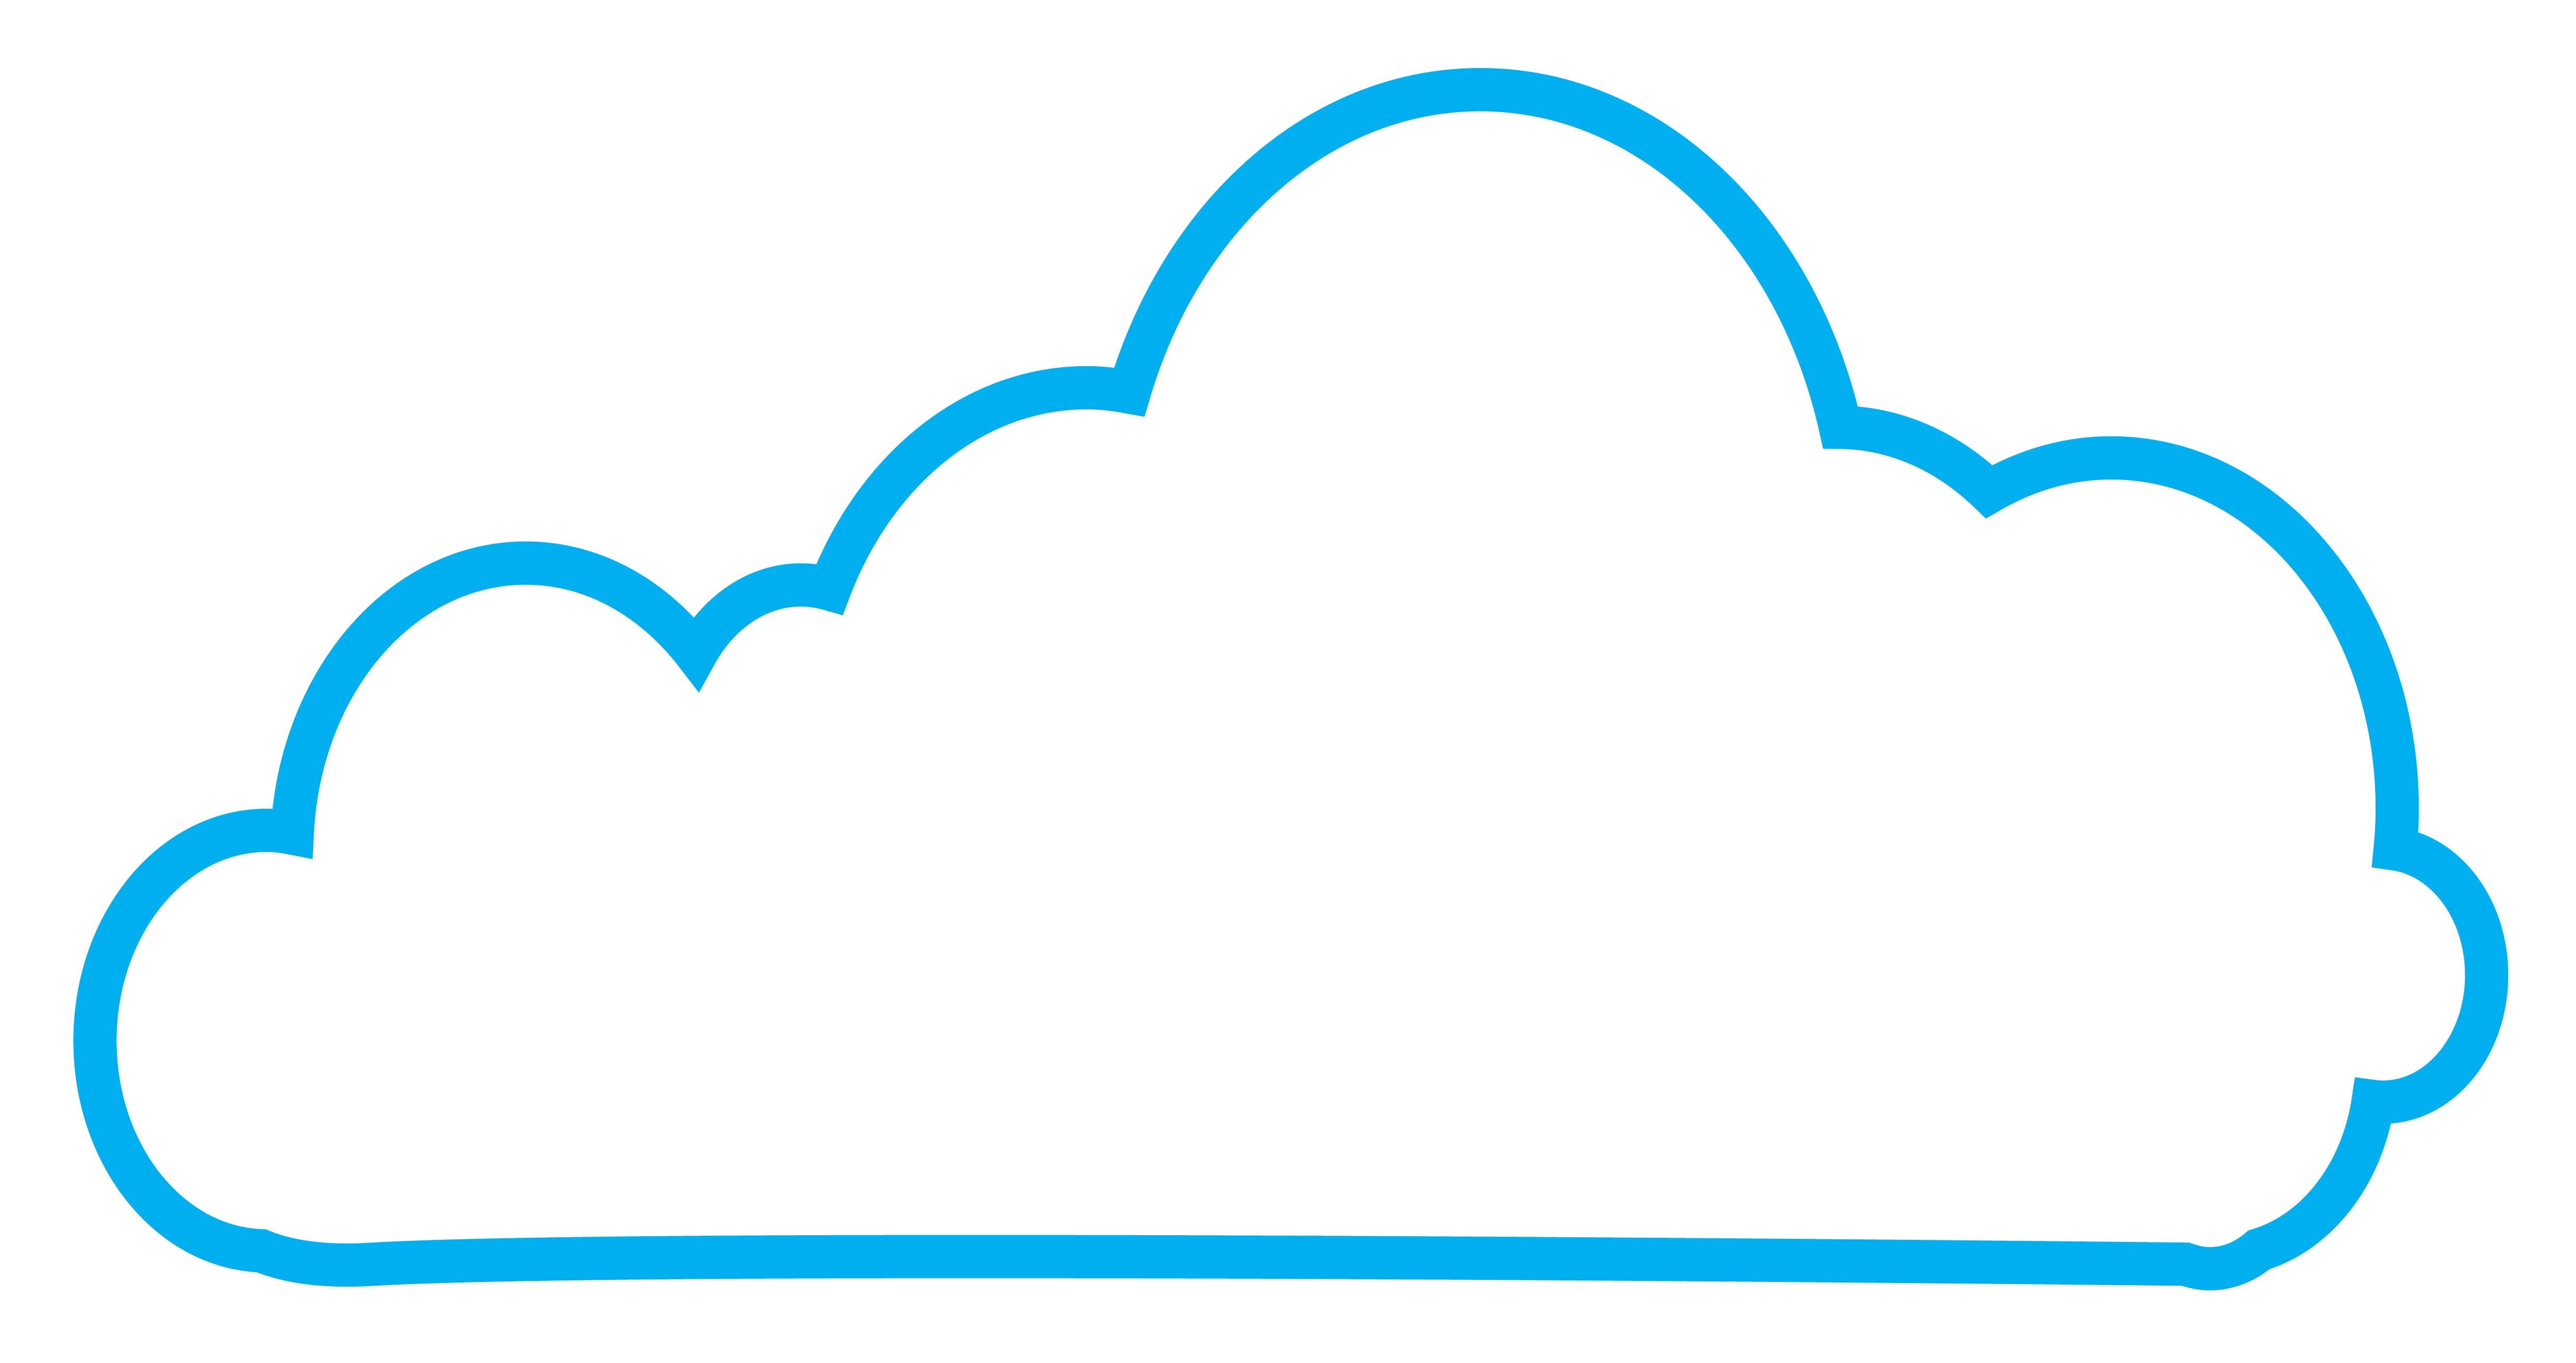 Png Internet Cloud - Hd Cloud Symbol Png Vector Cdr, Transparent background PNG HD thumbnail